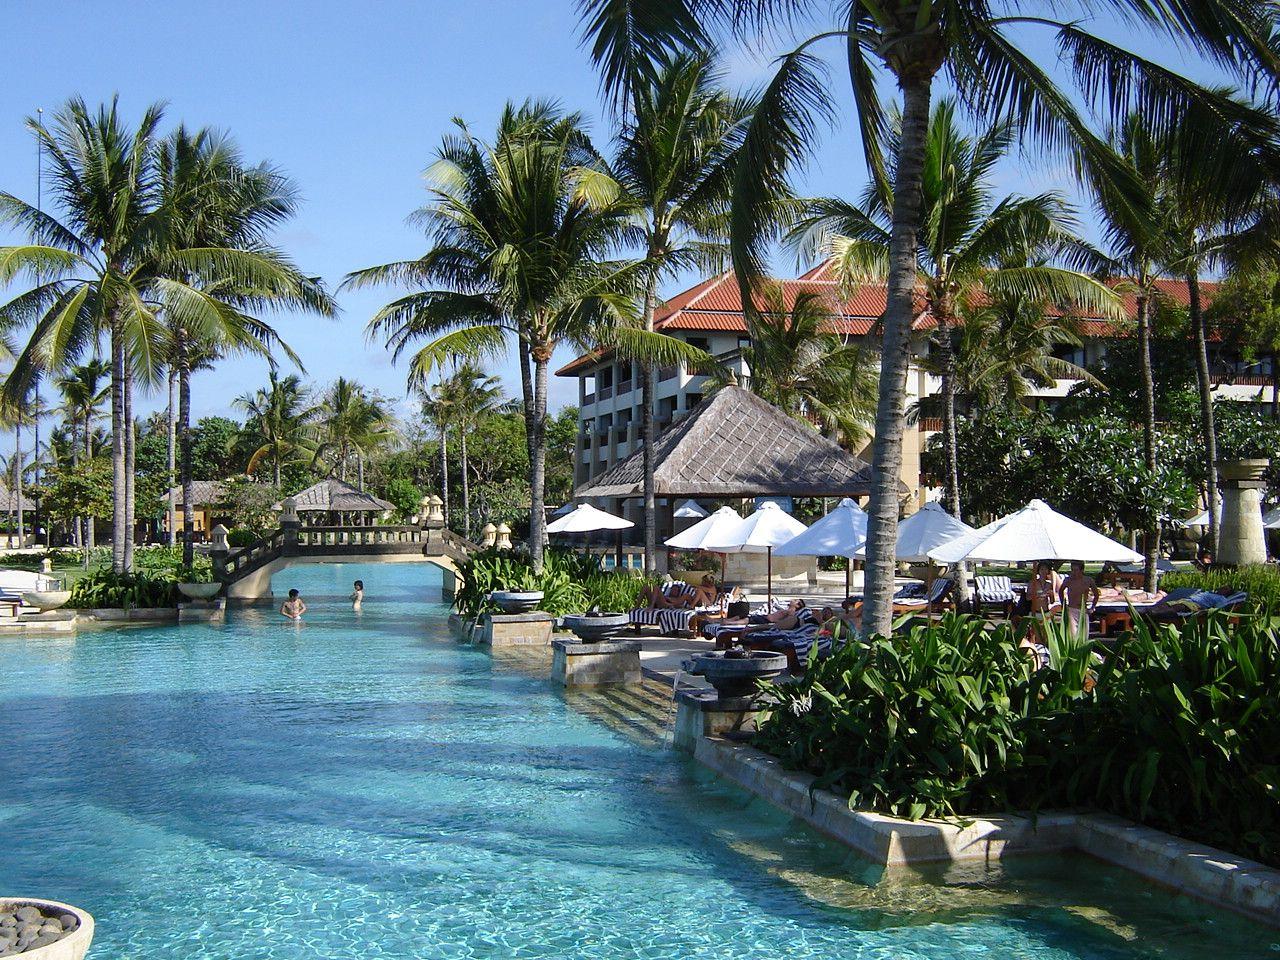 Resort Ideas Best 25 Bali Beach Resorts Ideas On Pinterest  Bali Indonesia